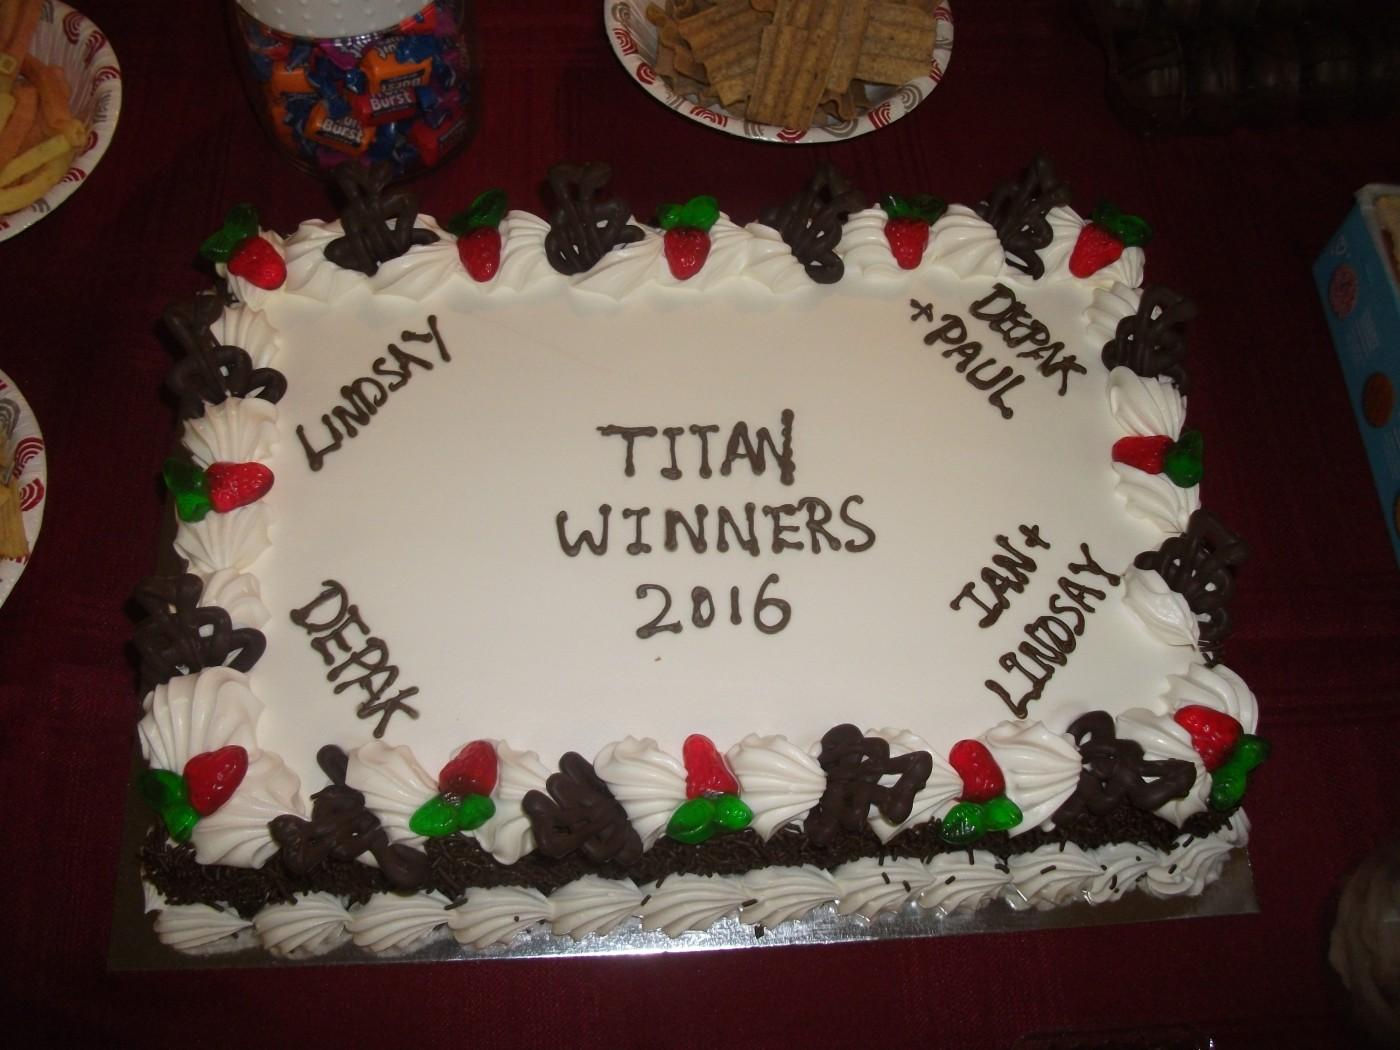 Titan 2016: Cake at Titan Club breakup.